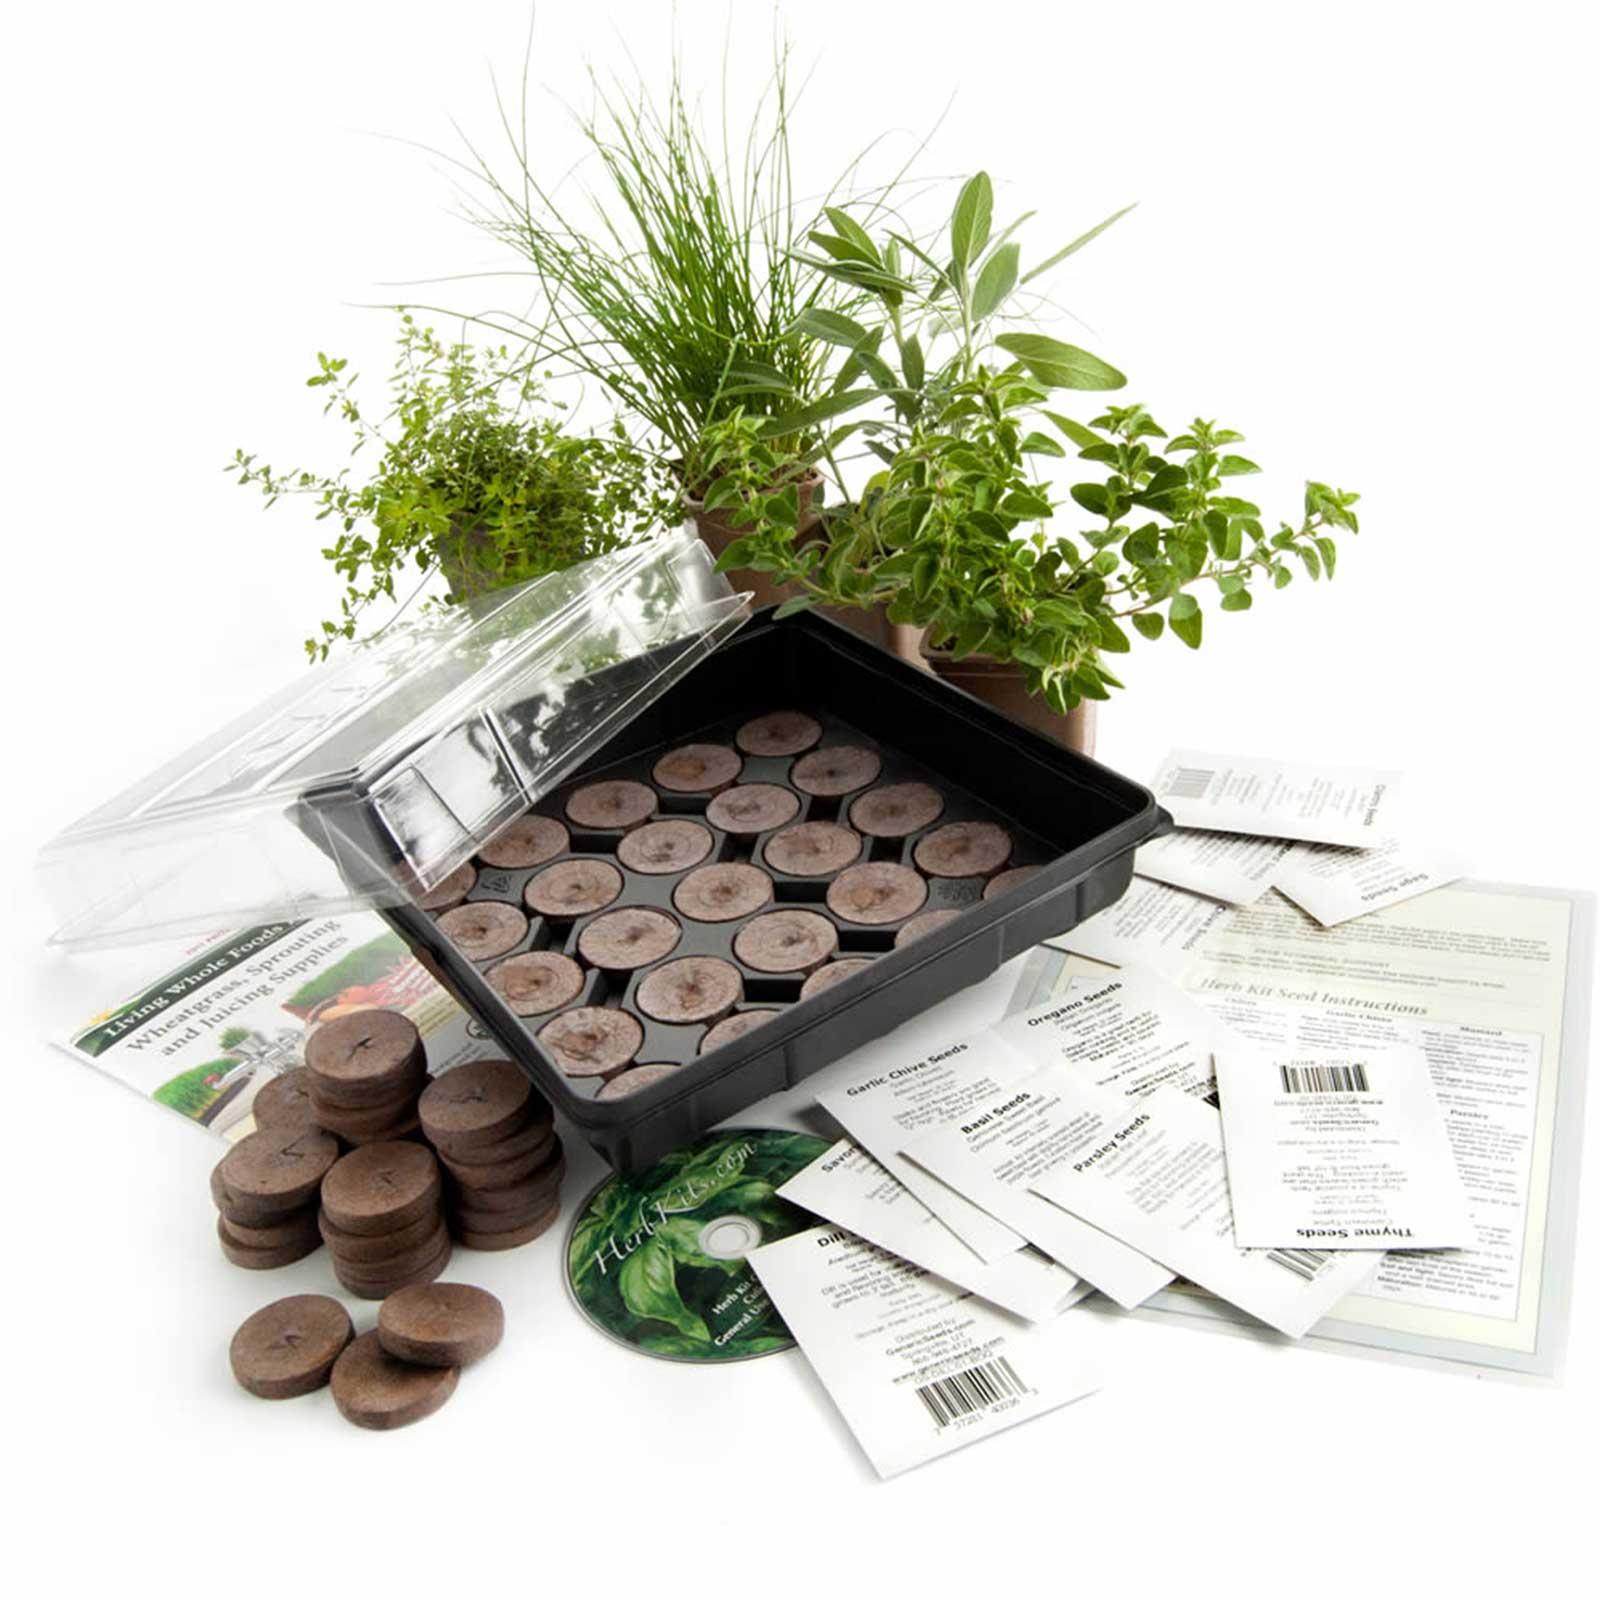 Cooking Herb Starter Kit u2013 Rated top